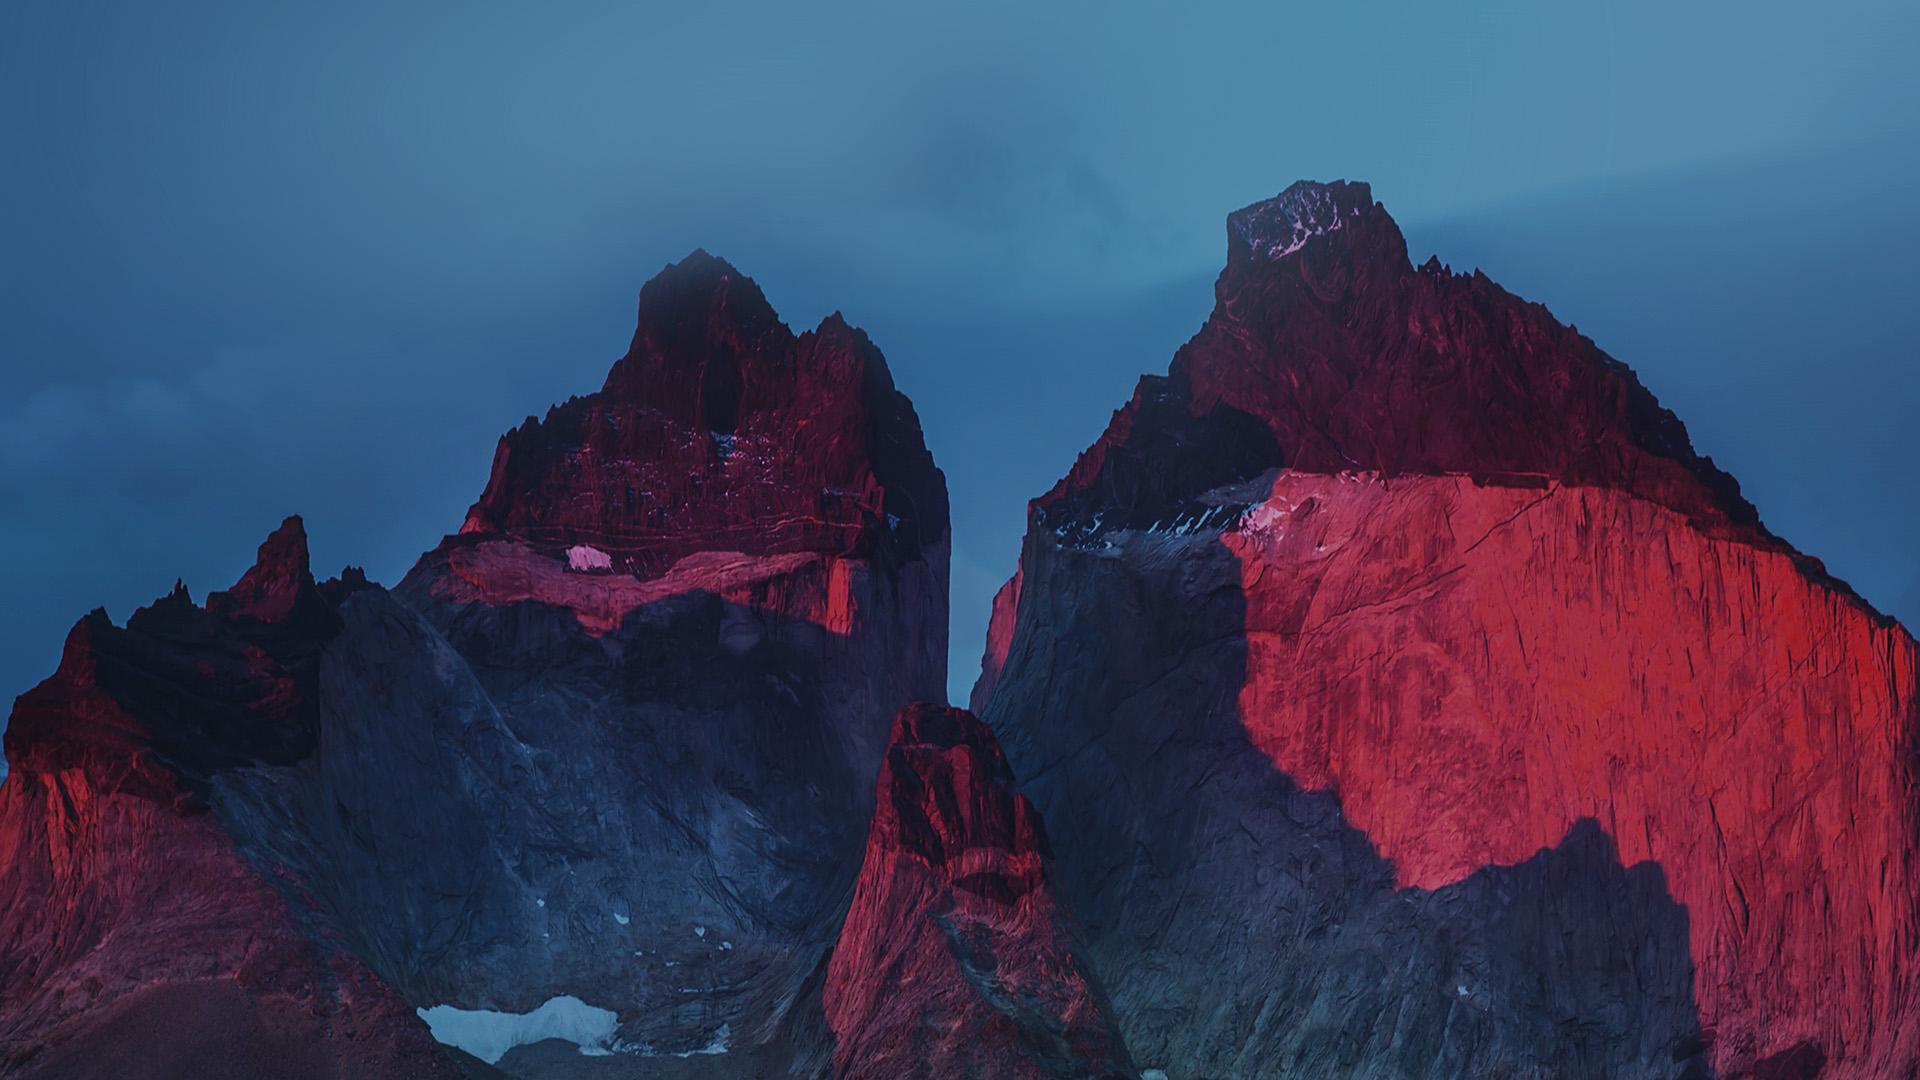 yosemite valley desktop wallpaper